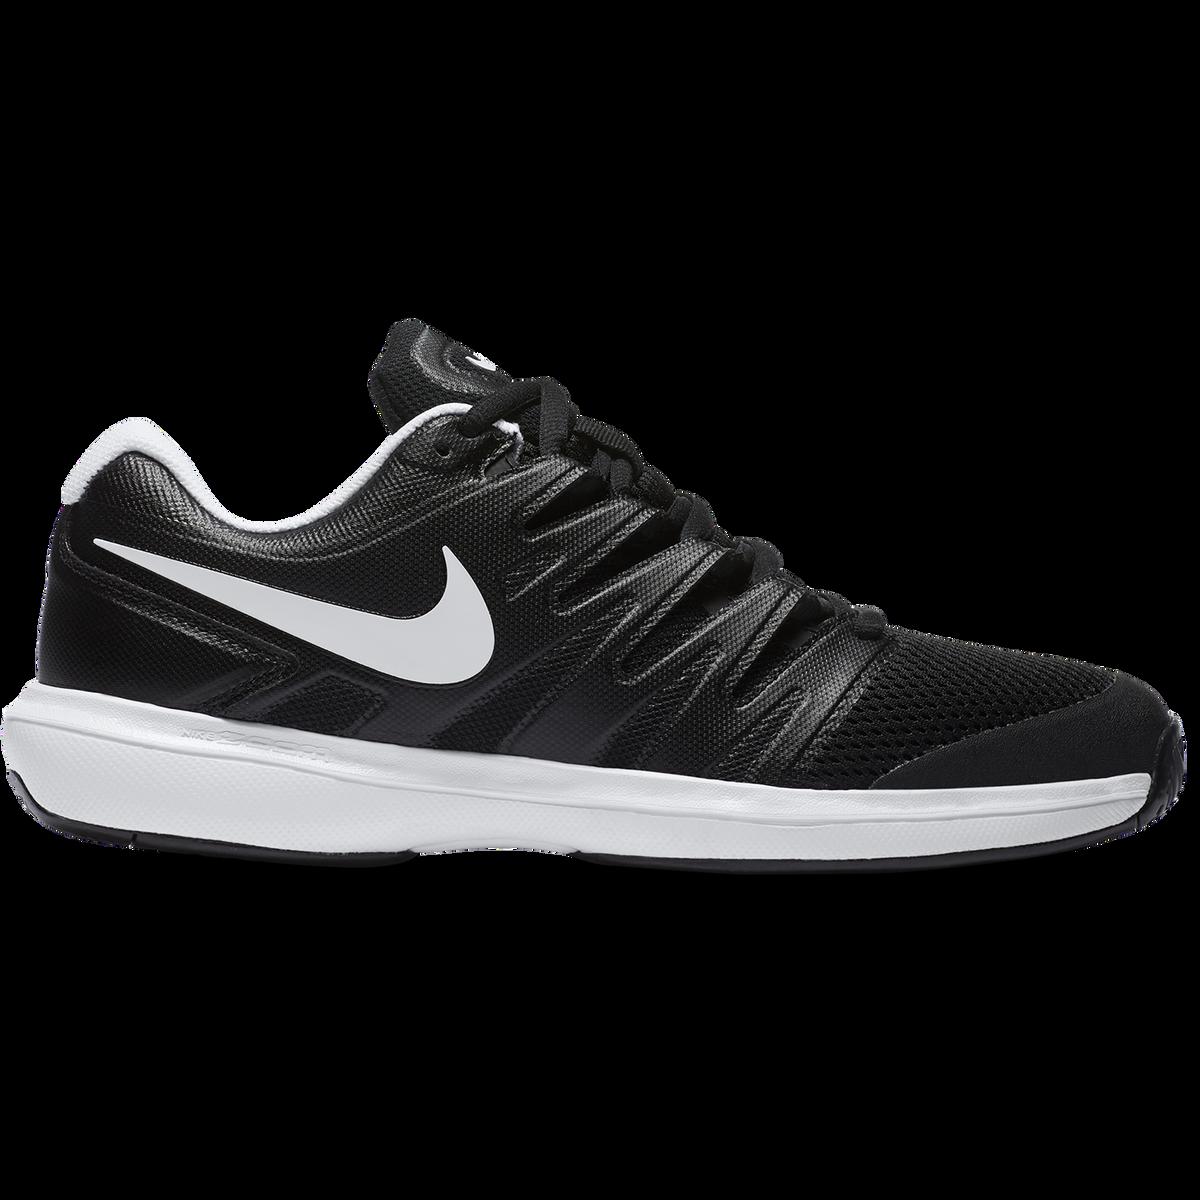 5bf7ea7b17 Nike Air Zoom Prestige Tennis Shoe | PGA TOUR Superstore